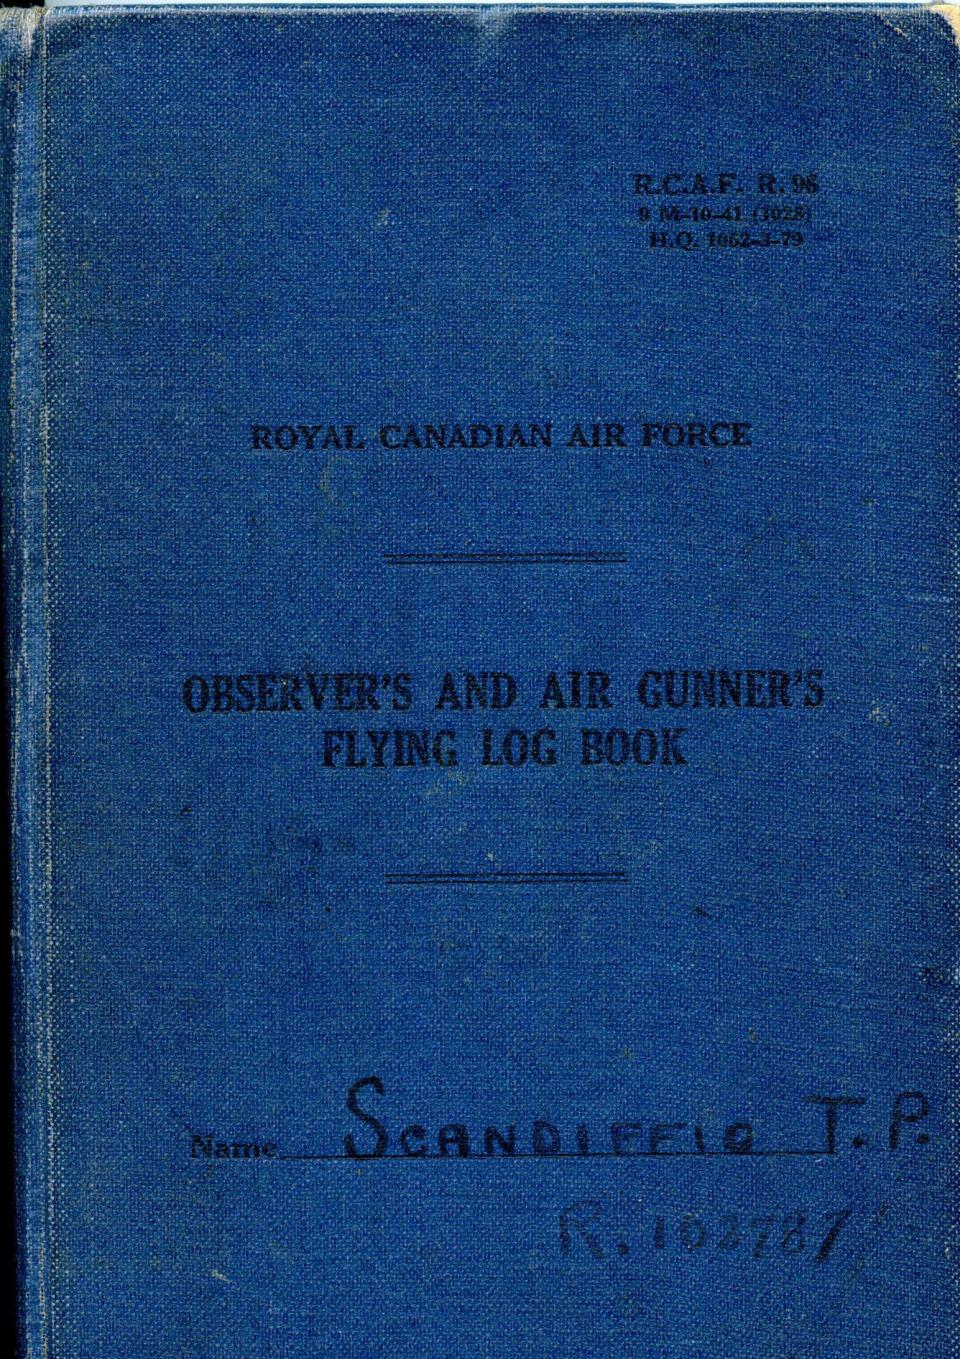 Thomas Scandiffio, Gunner Logbook, cover